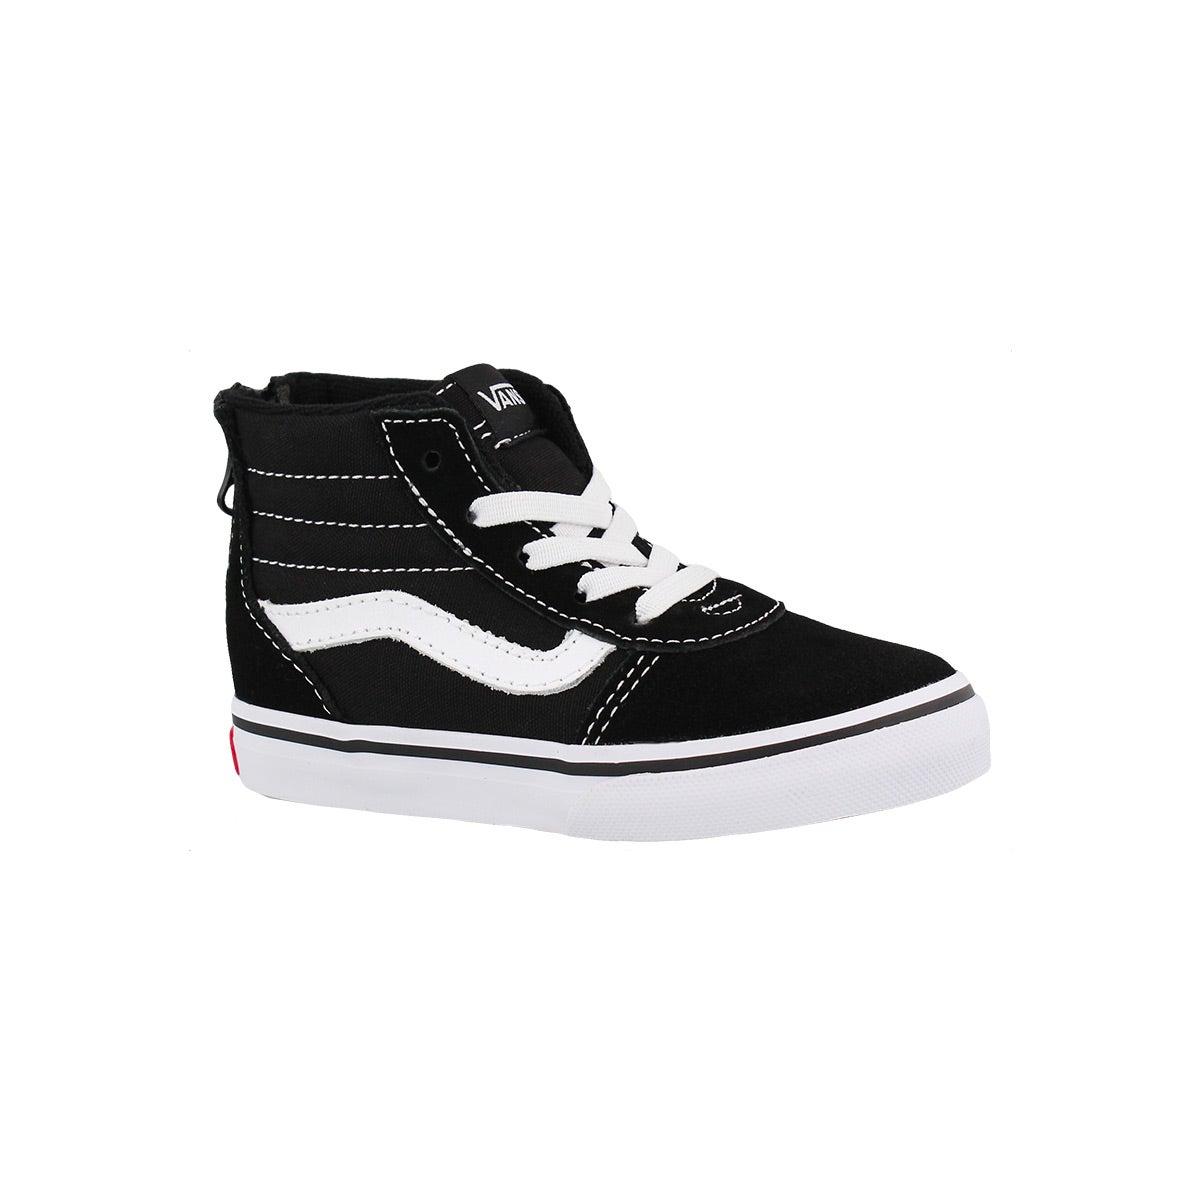 Infants' WARD HI ZIP black/white canvas sneakers